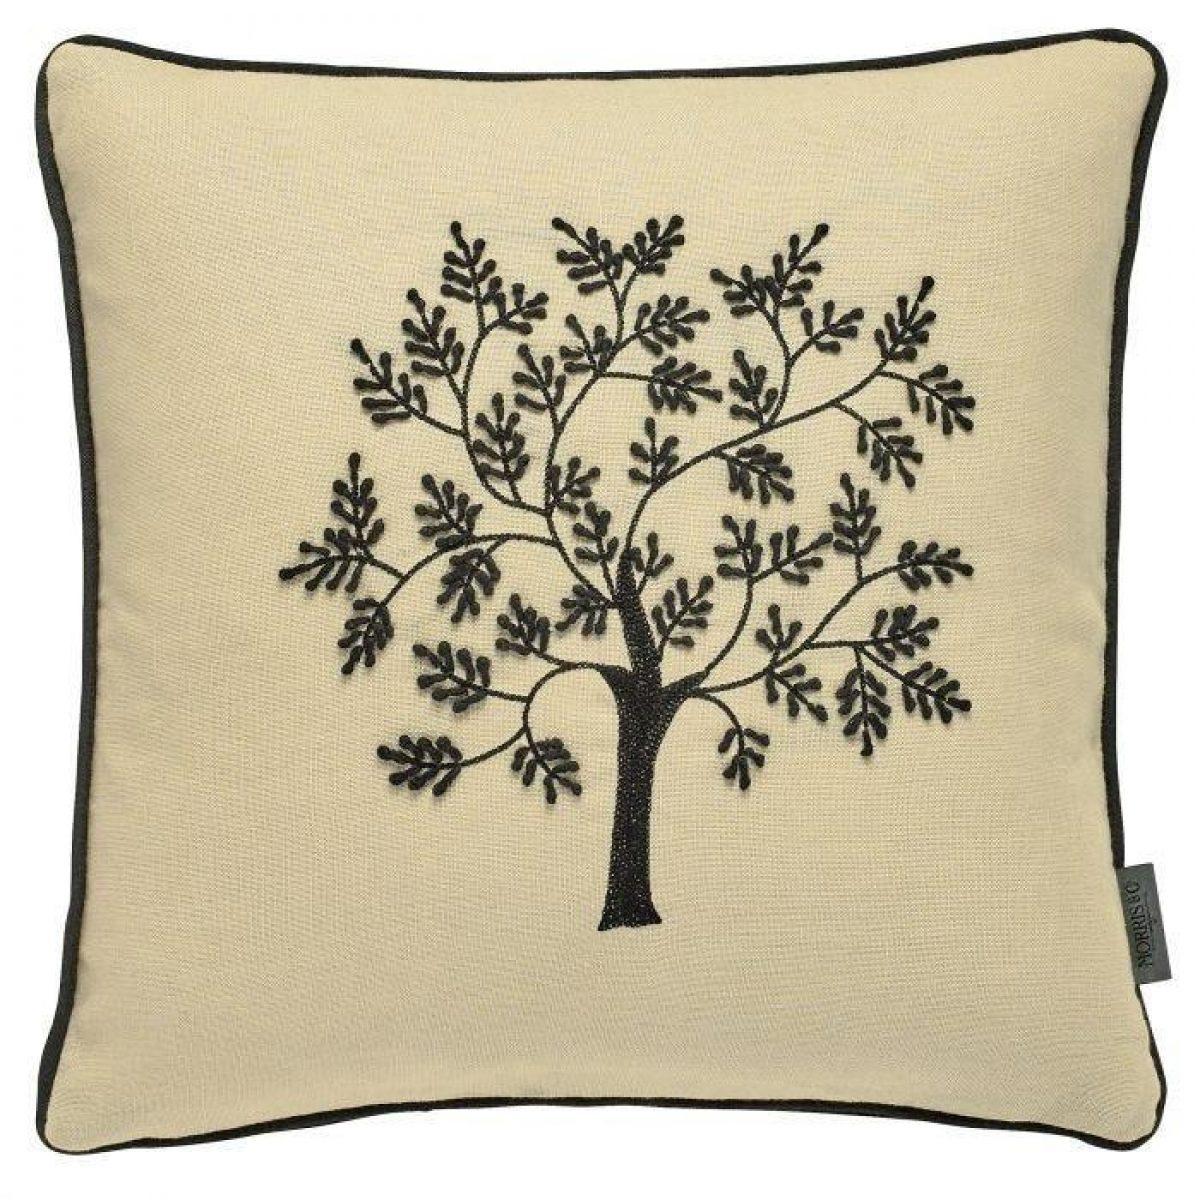 Seaweed Cushion